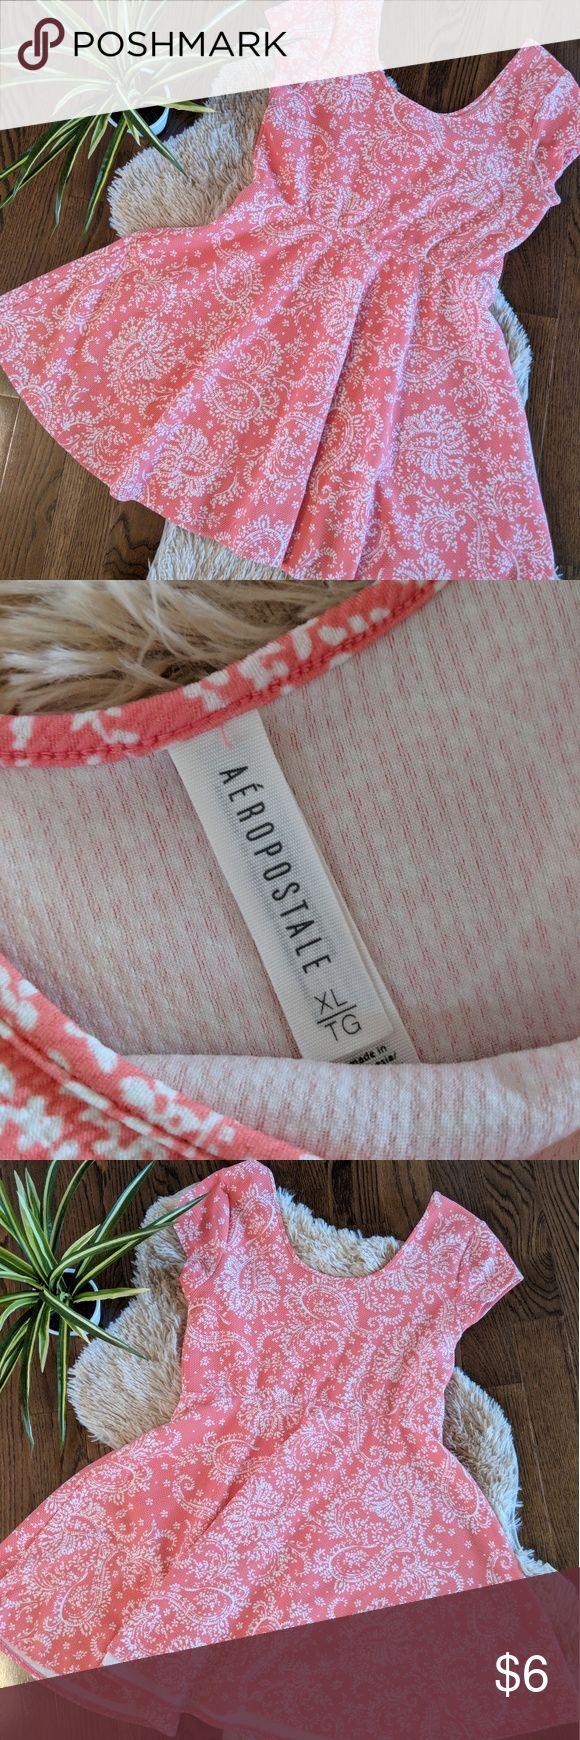 Floral Print Dress ✨ Salmon Color, wide neck, short sleeve dress Aeropostale Dresses